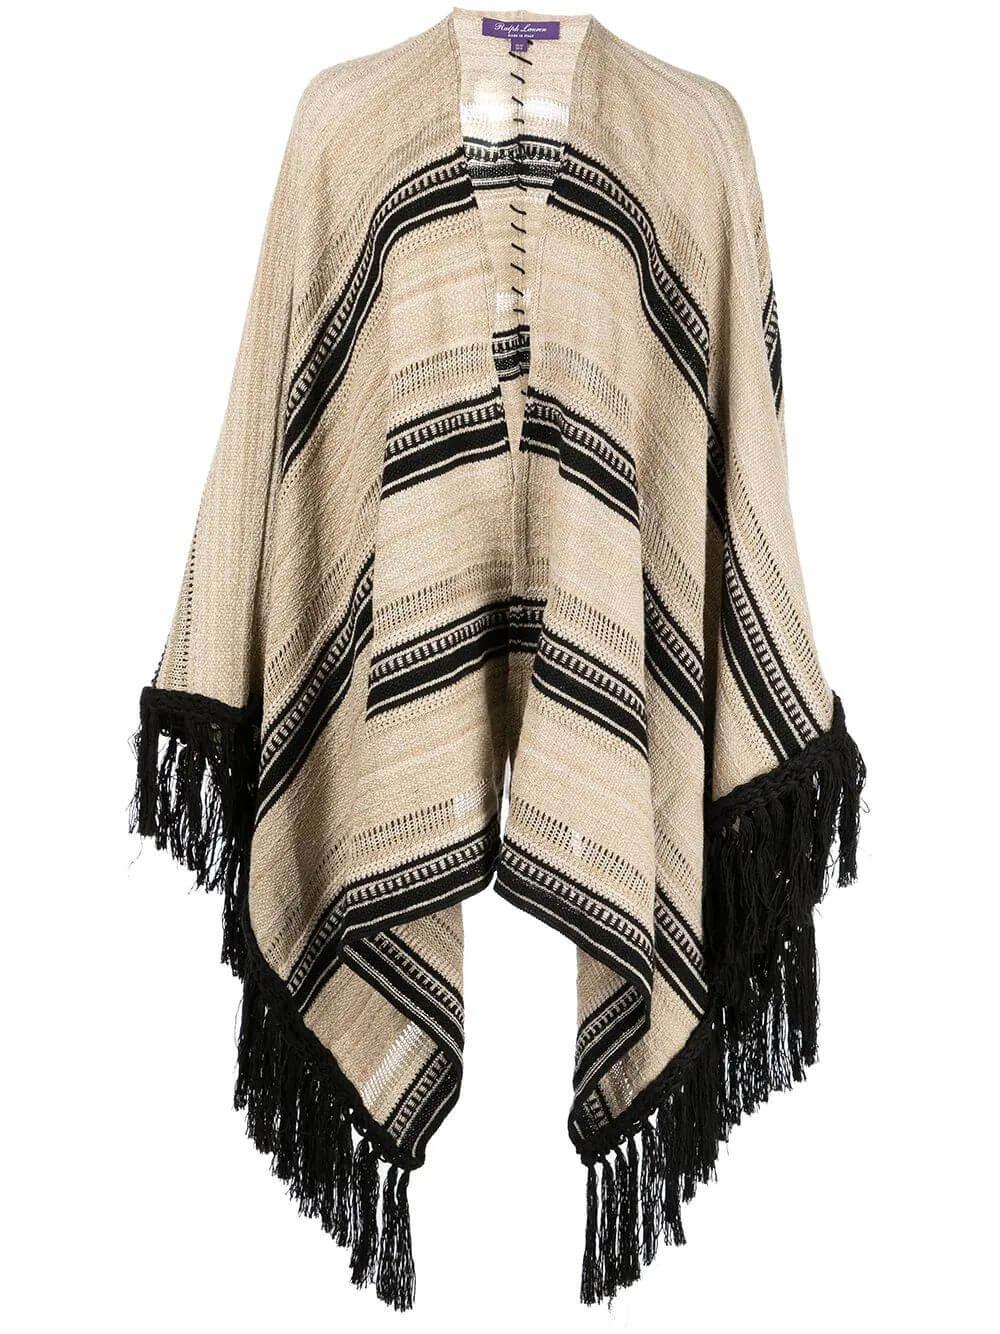 Ruana Sweater Blanket Striped Poncho Item # 290845671001